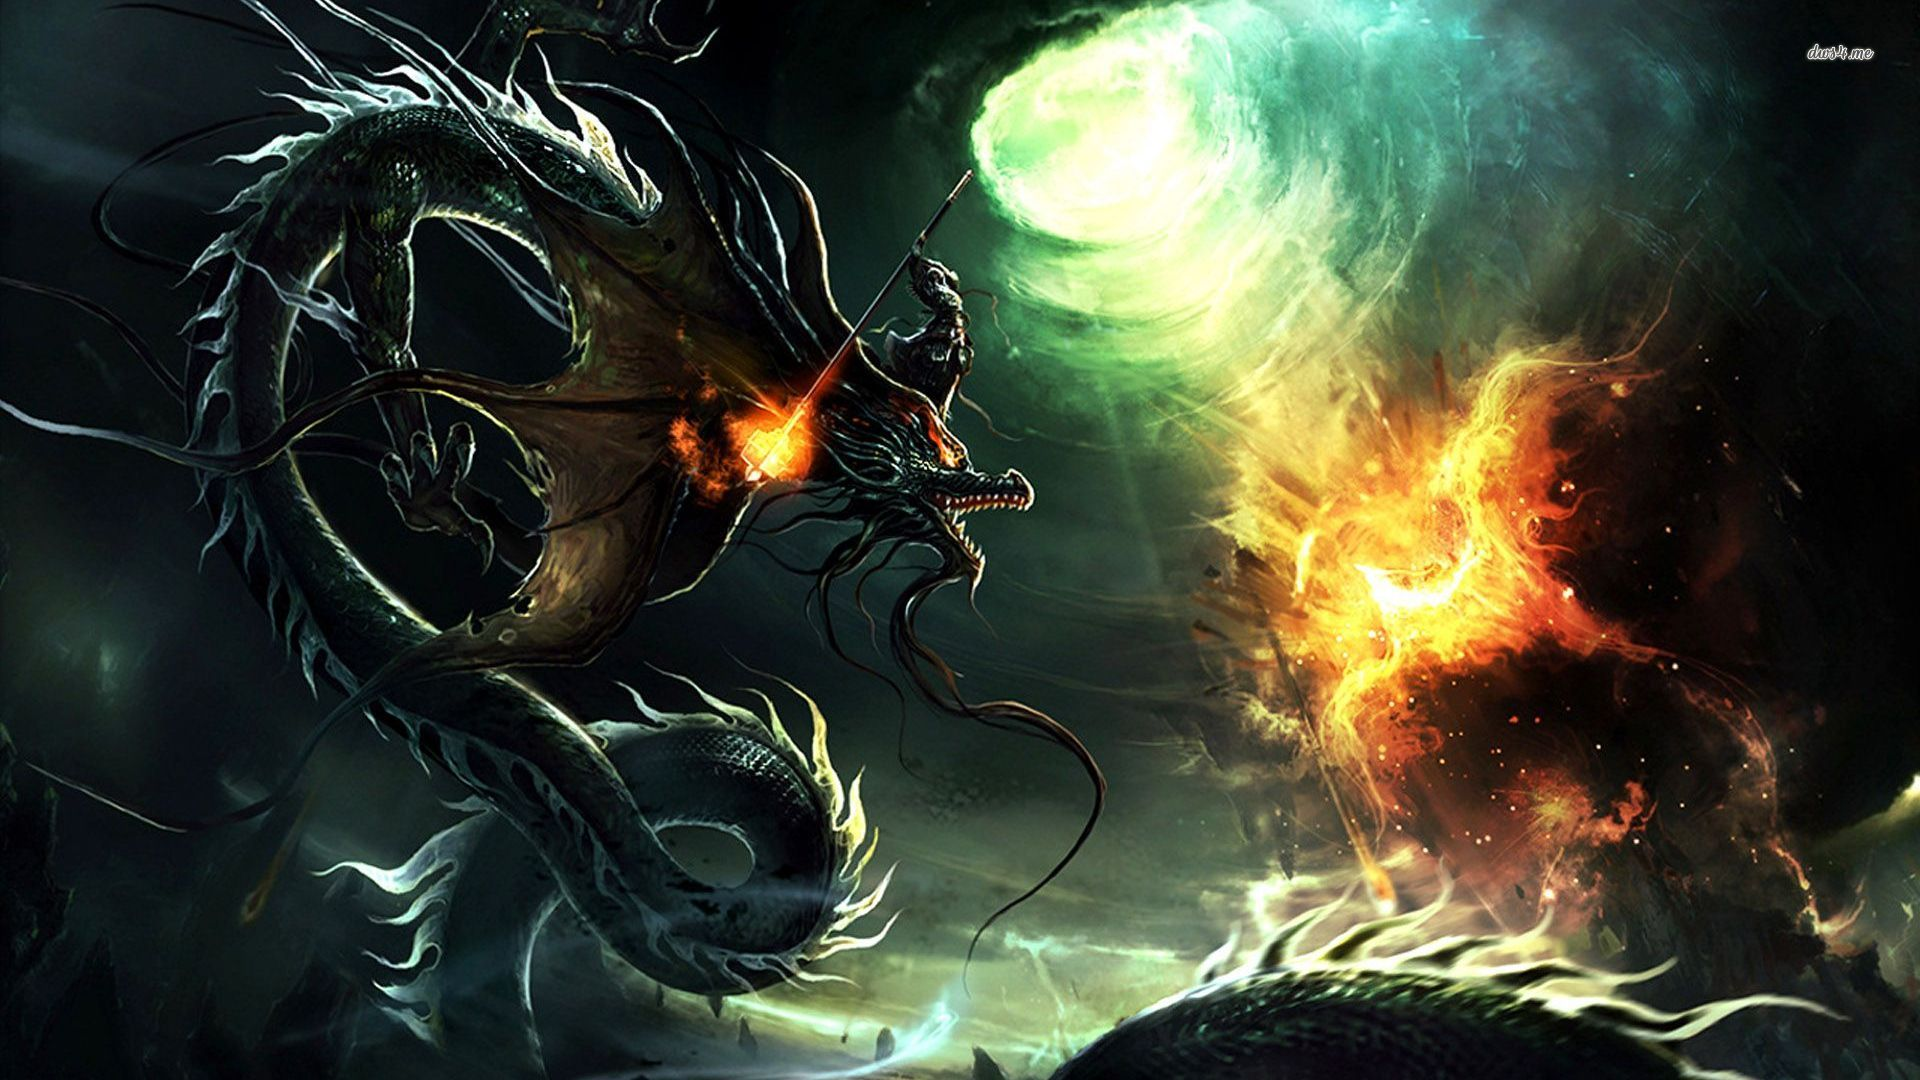 Dragon vs phoenix wallpaper Wallpaper Wide HD 1920x1080